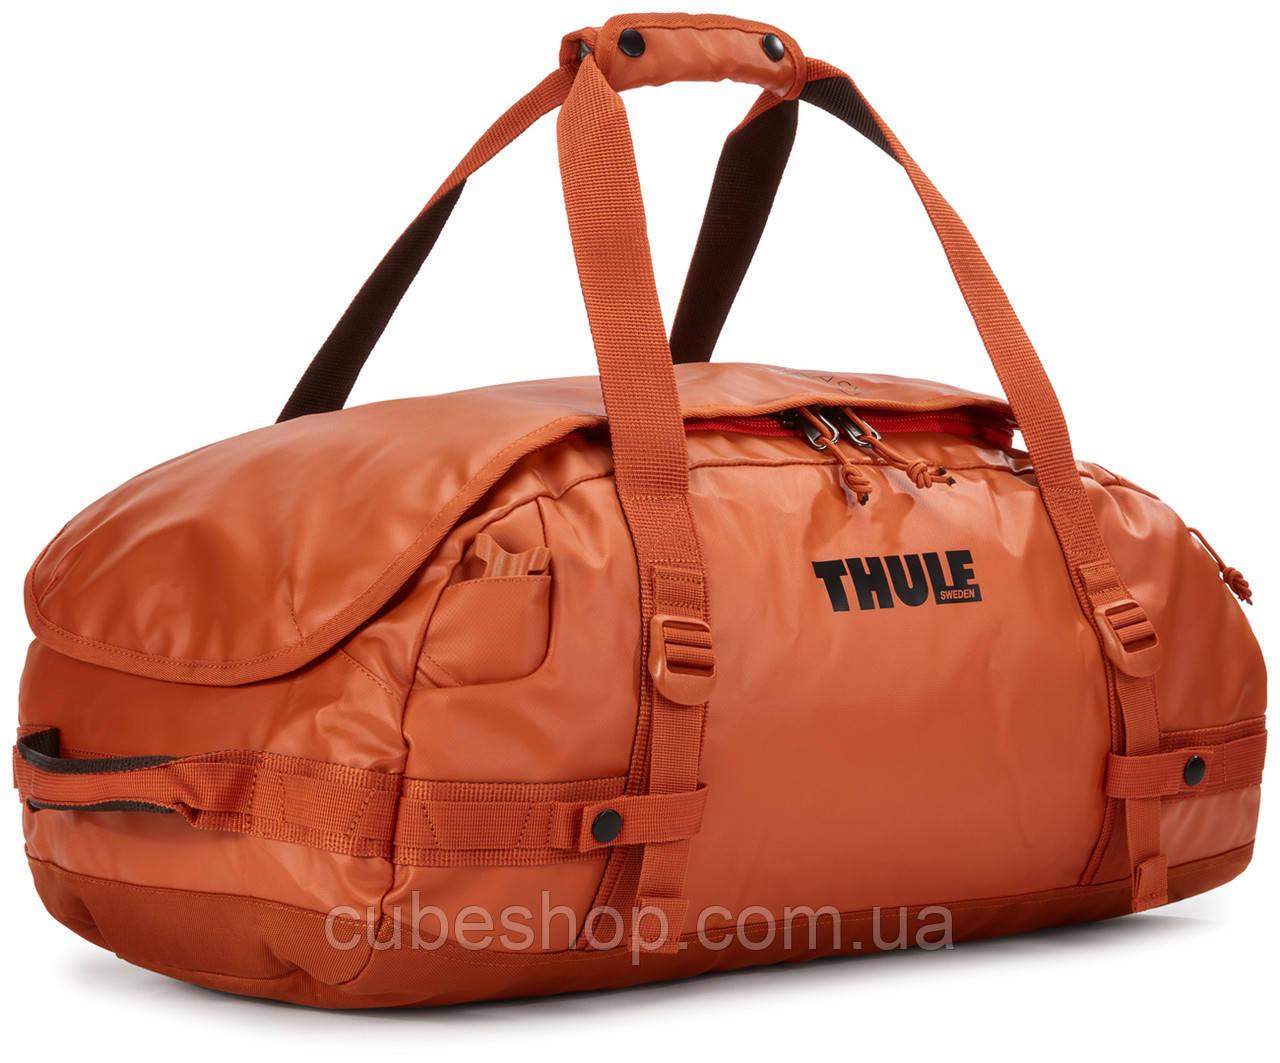 Спортивная сумка-рюкзак Thule Chasm 40L Autumnal (оранжевый)